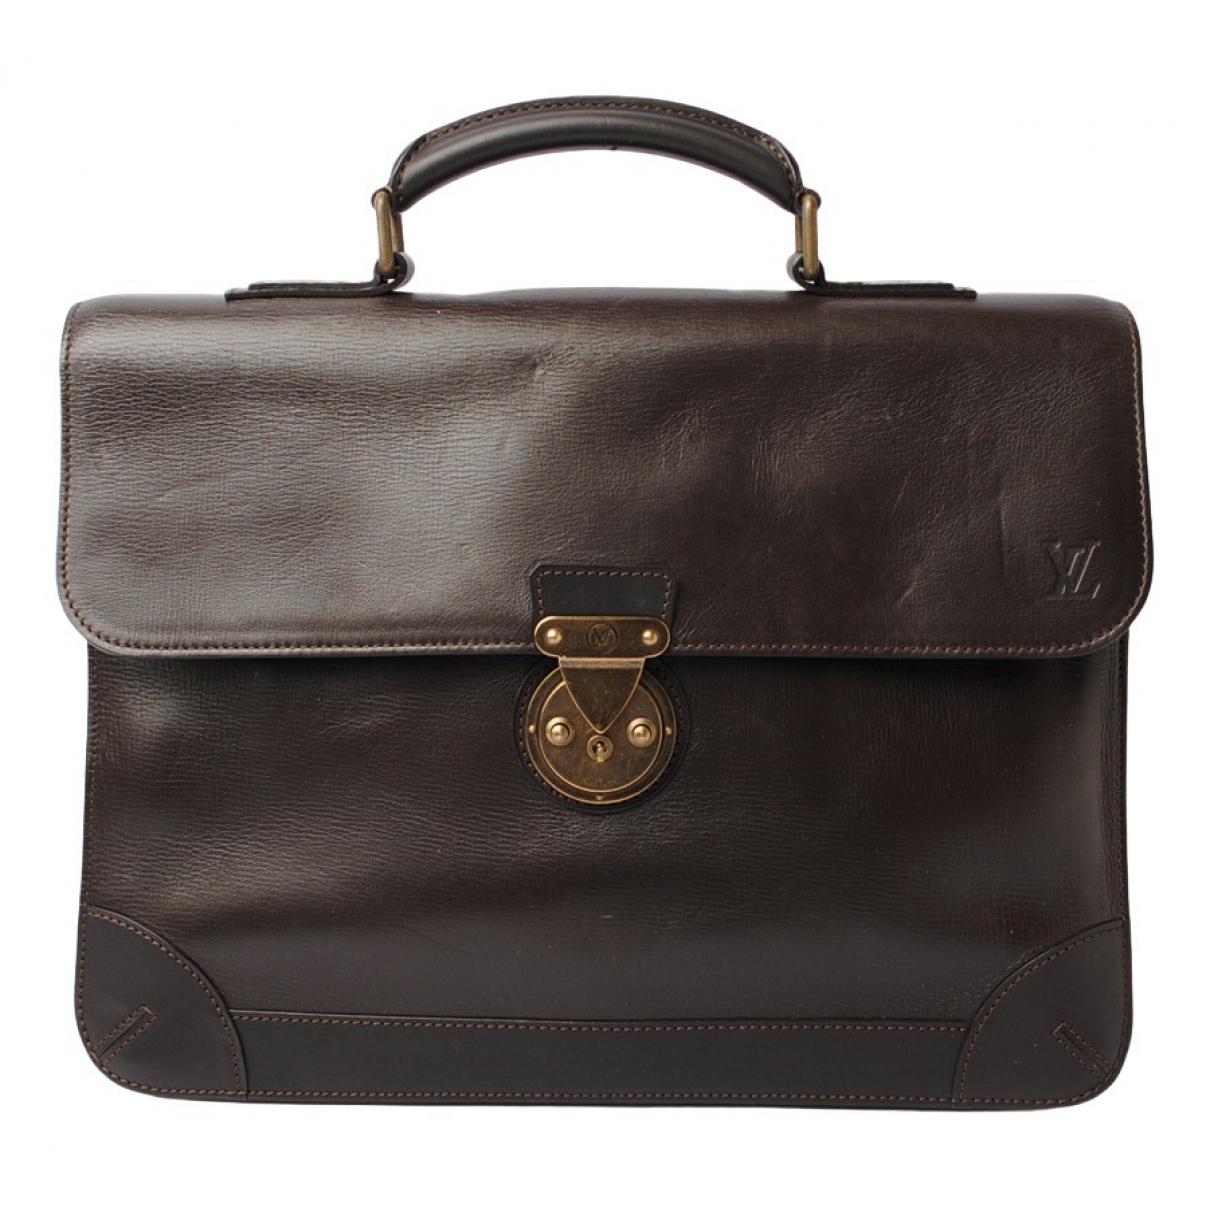 Louis Vuitton N Brown Leather handbag for Women N